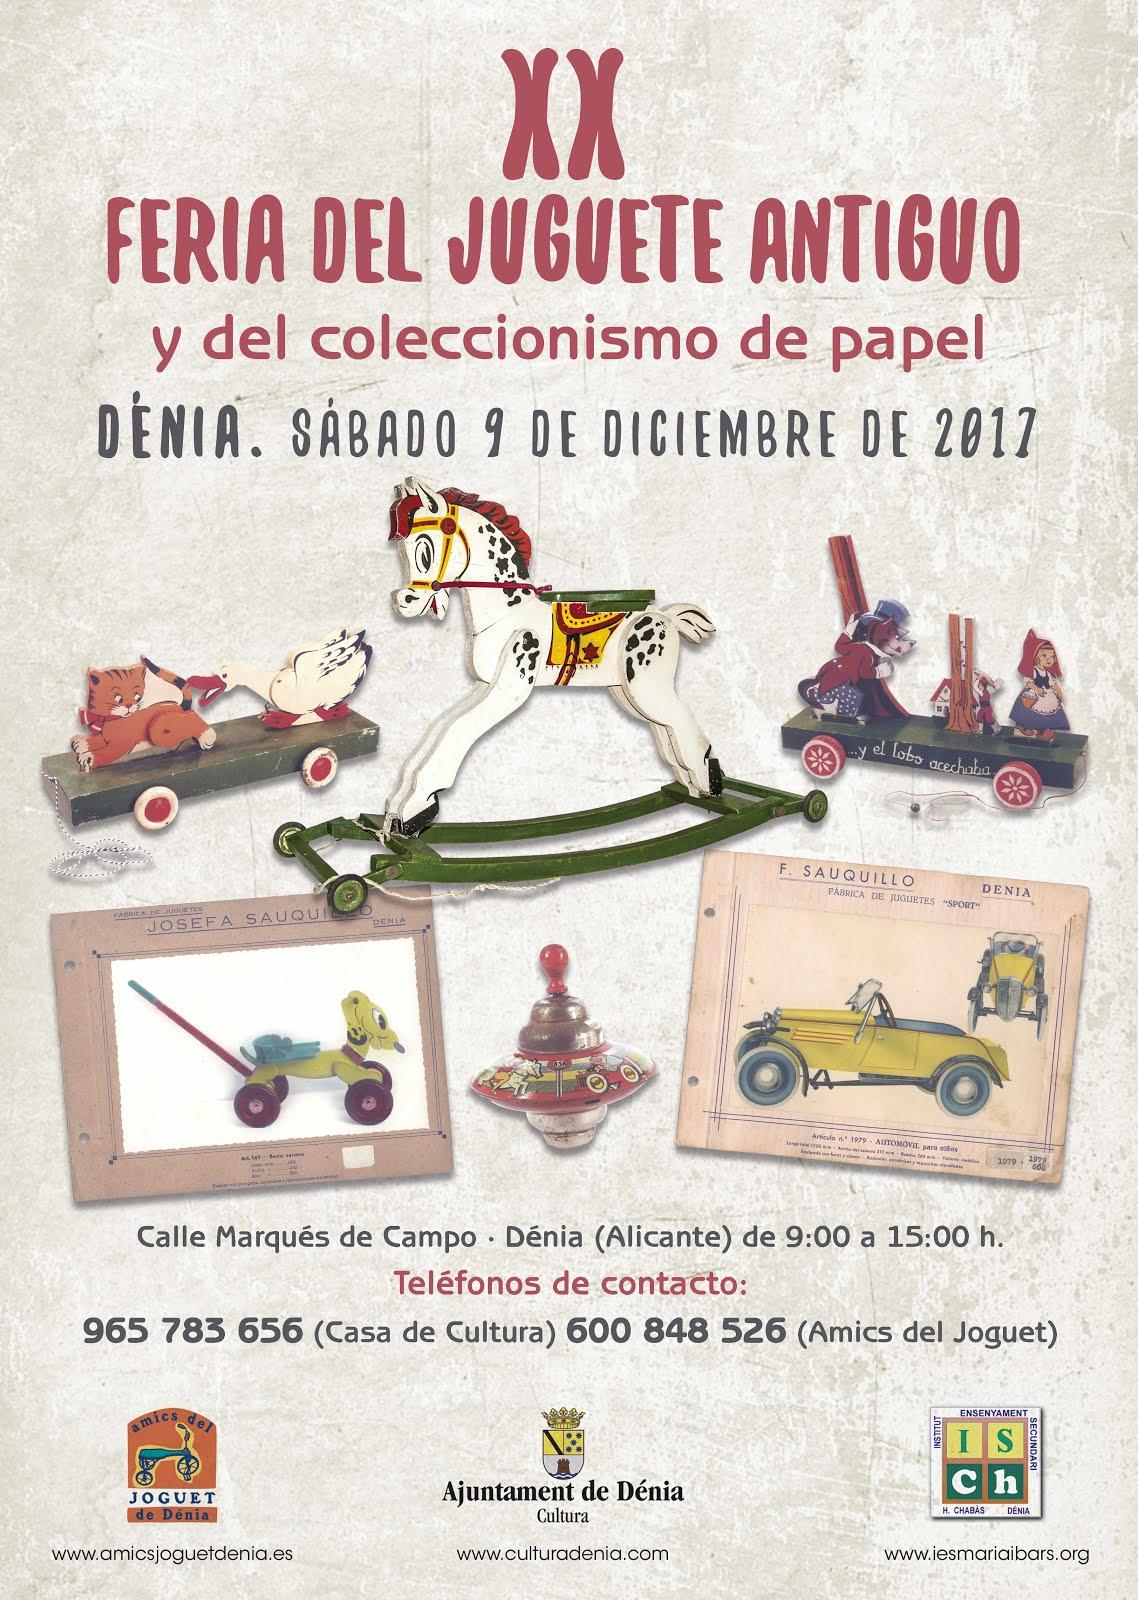 Feria del Juguete antiguo. Dénia